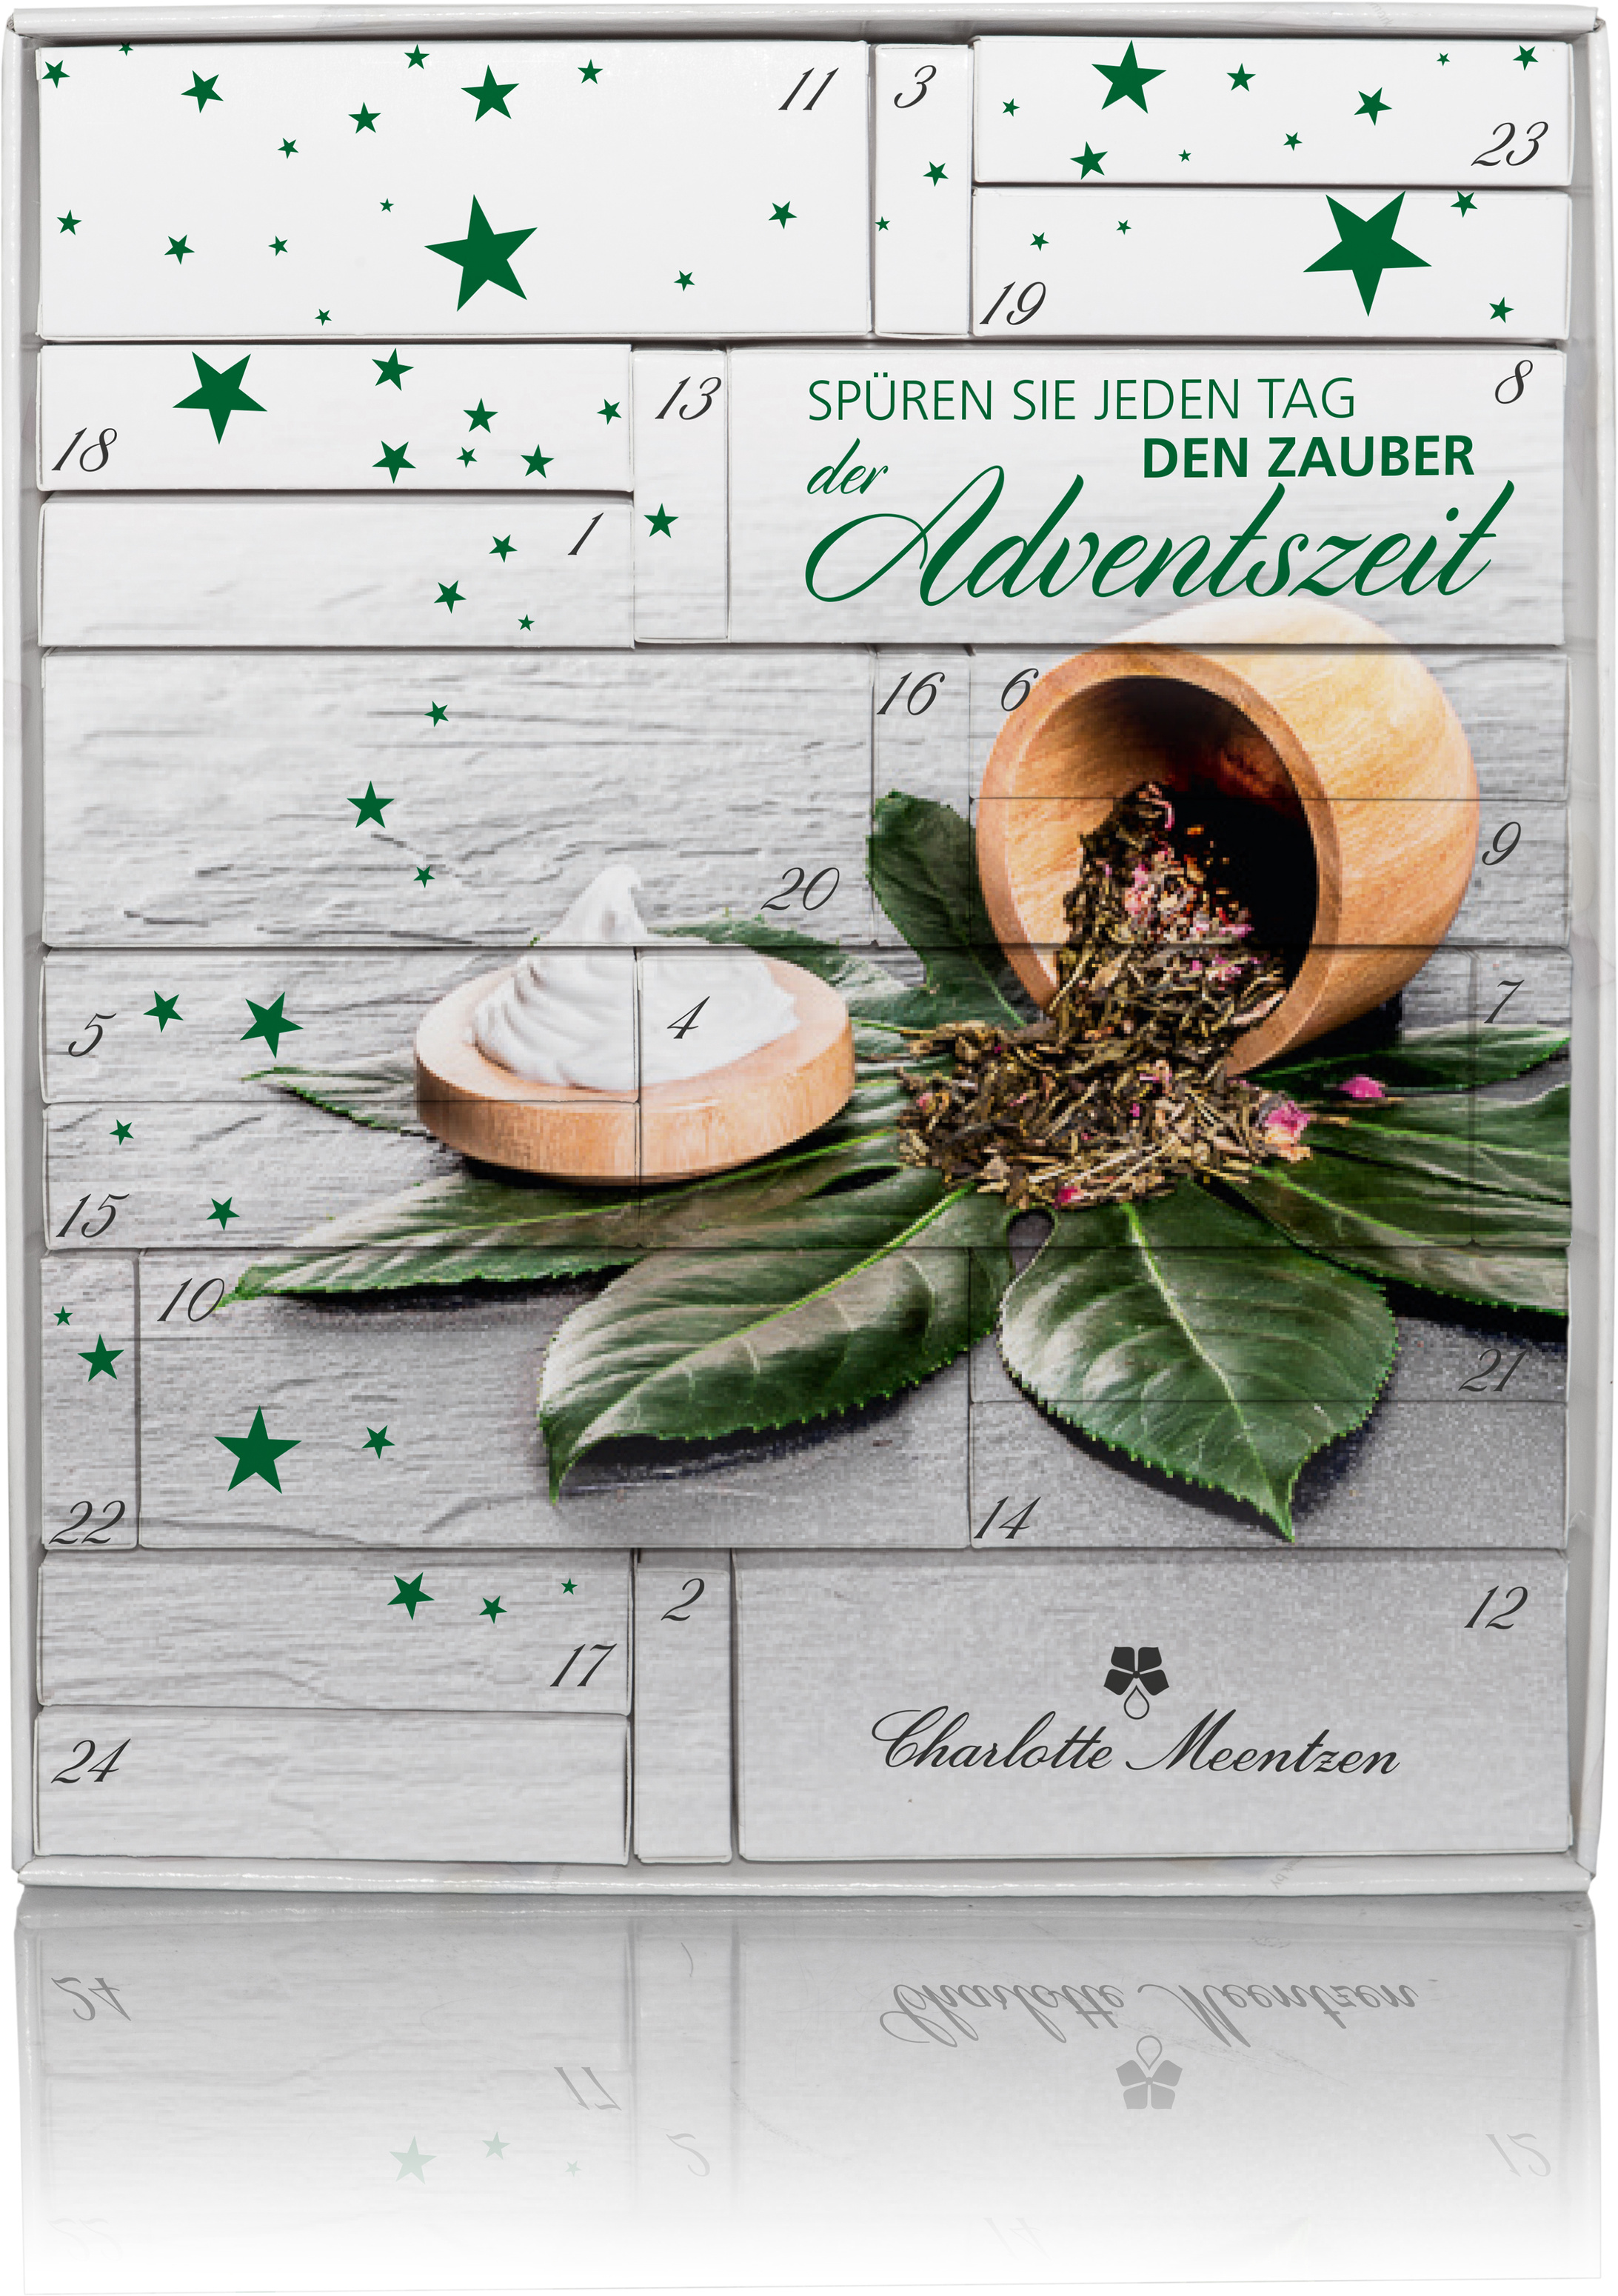 Charlotte Meentzen Adventskalender 2015